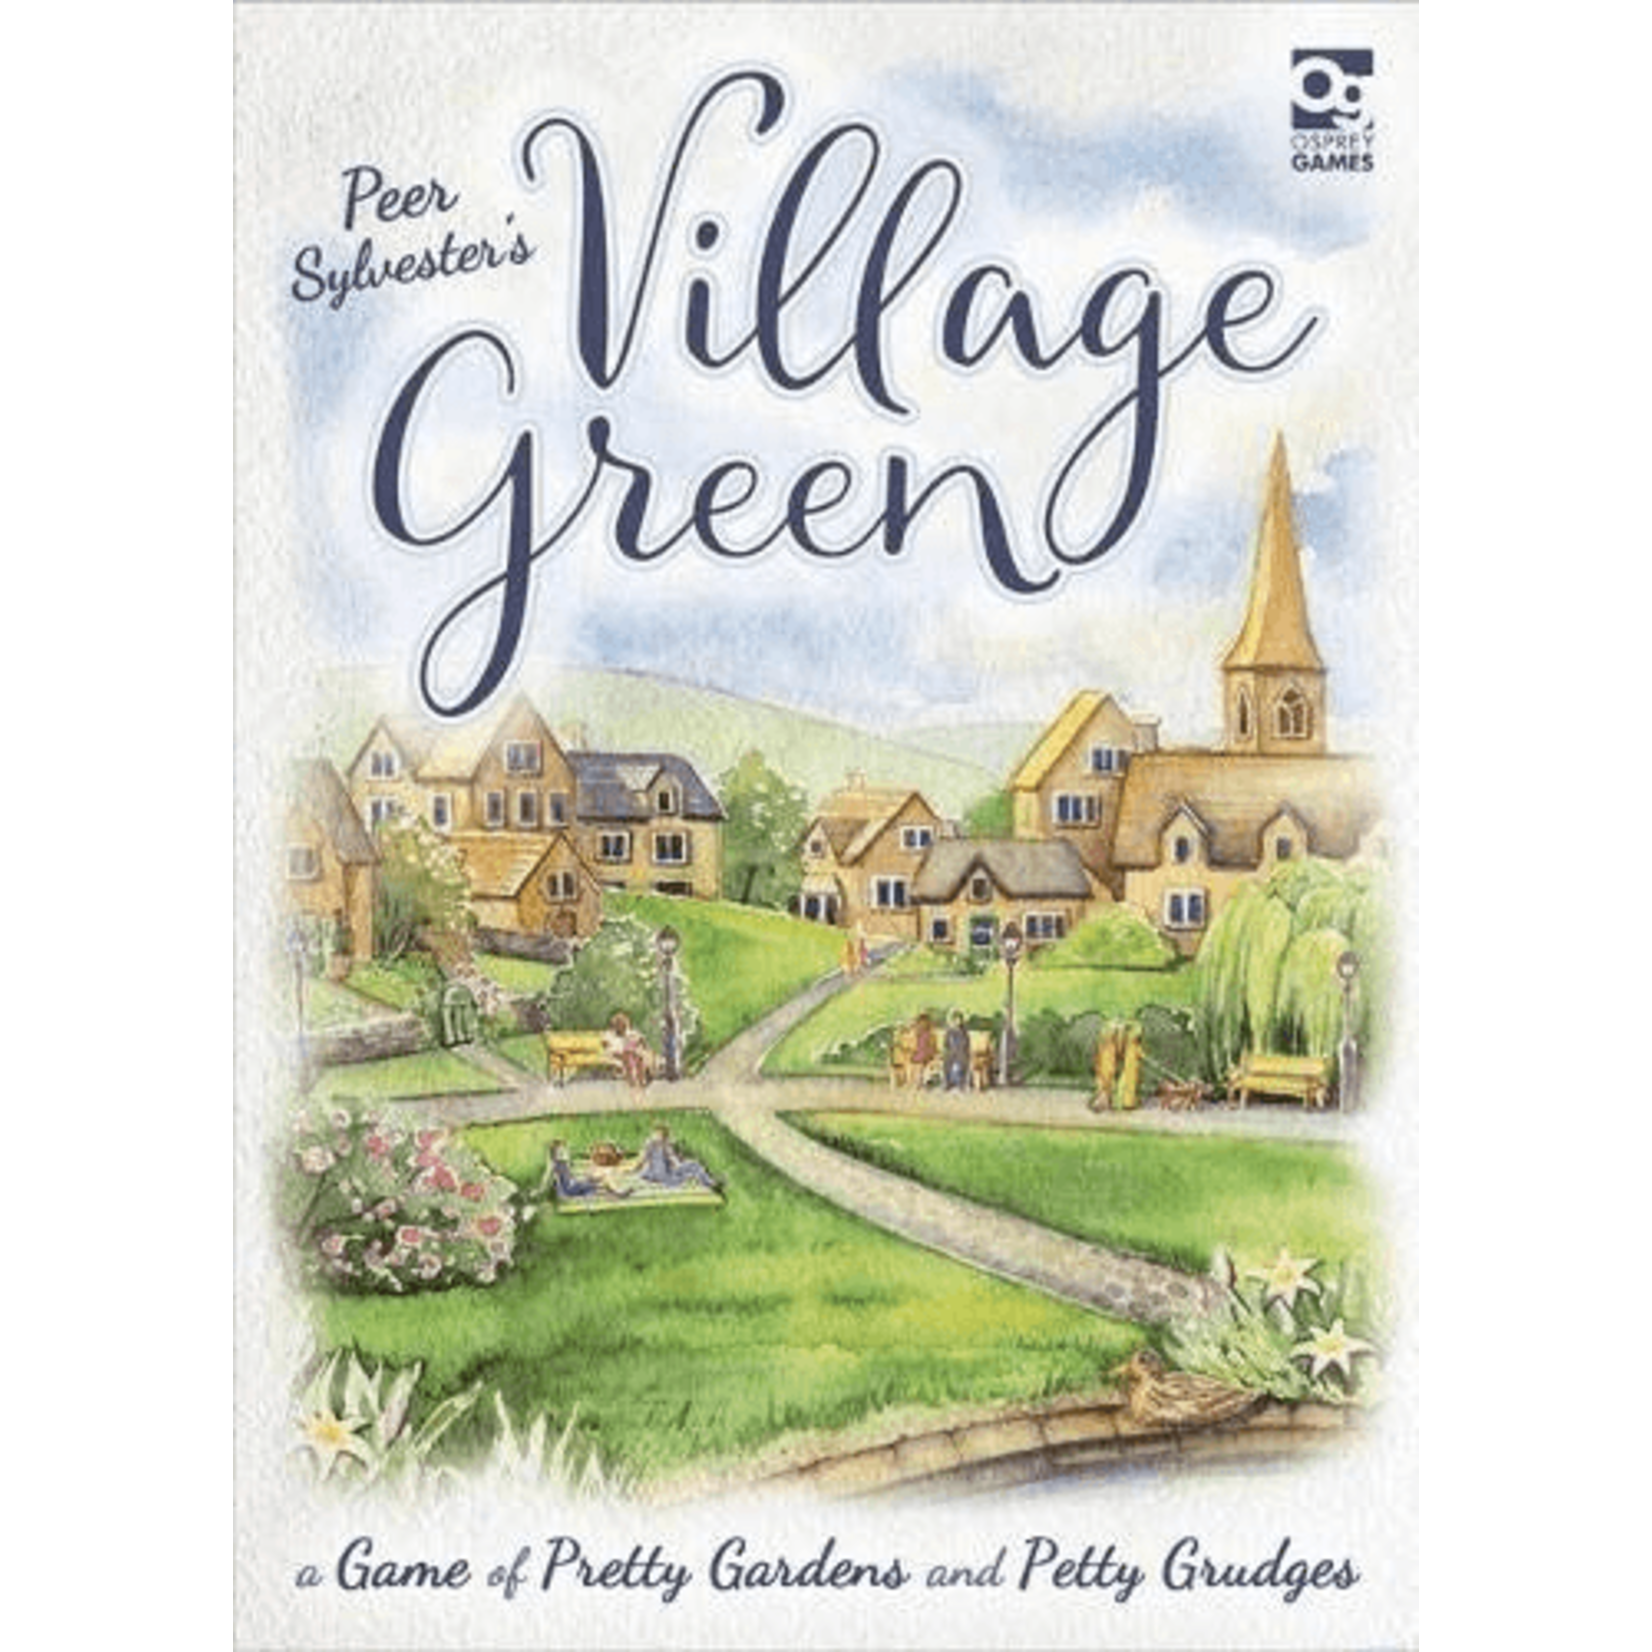 Osprey Village Green